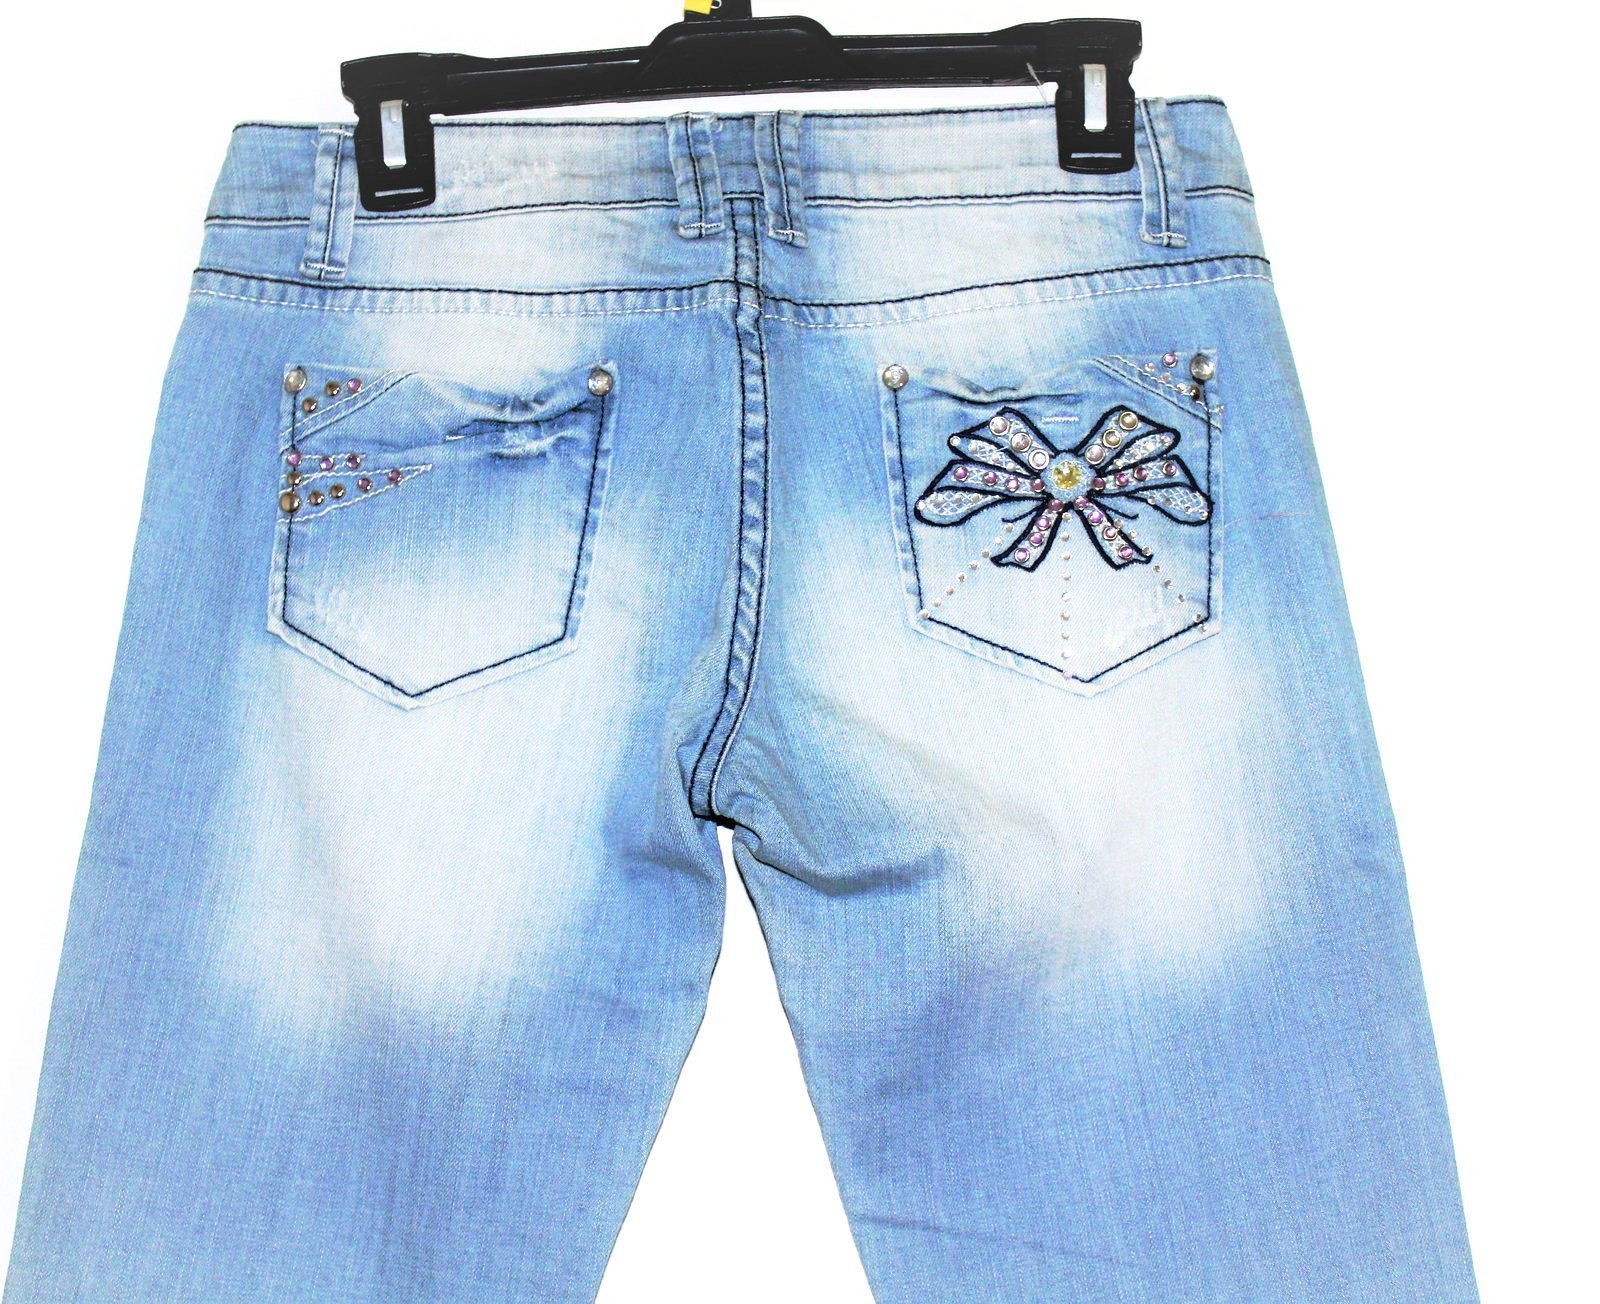 Liuce's light blue boot cut denim jeans